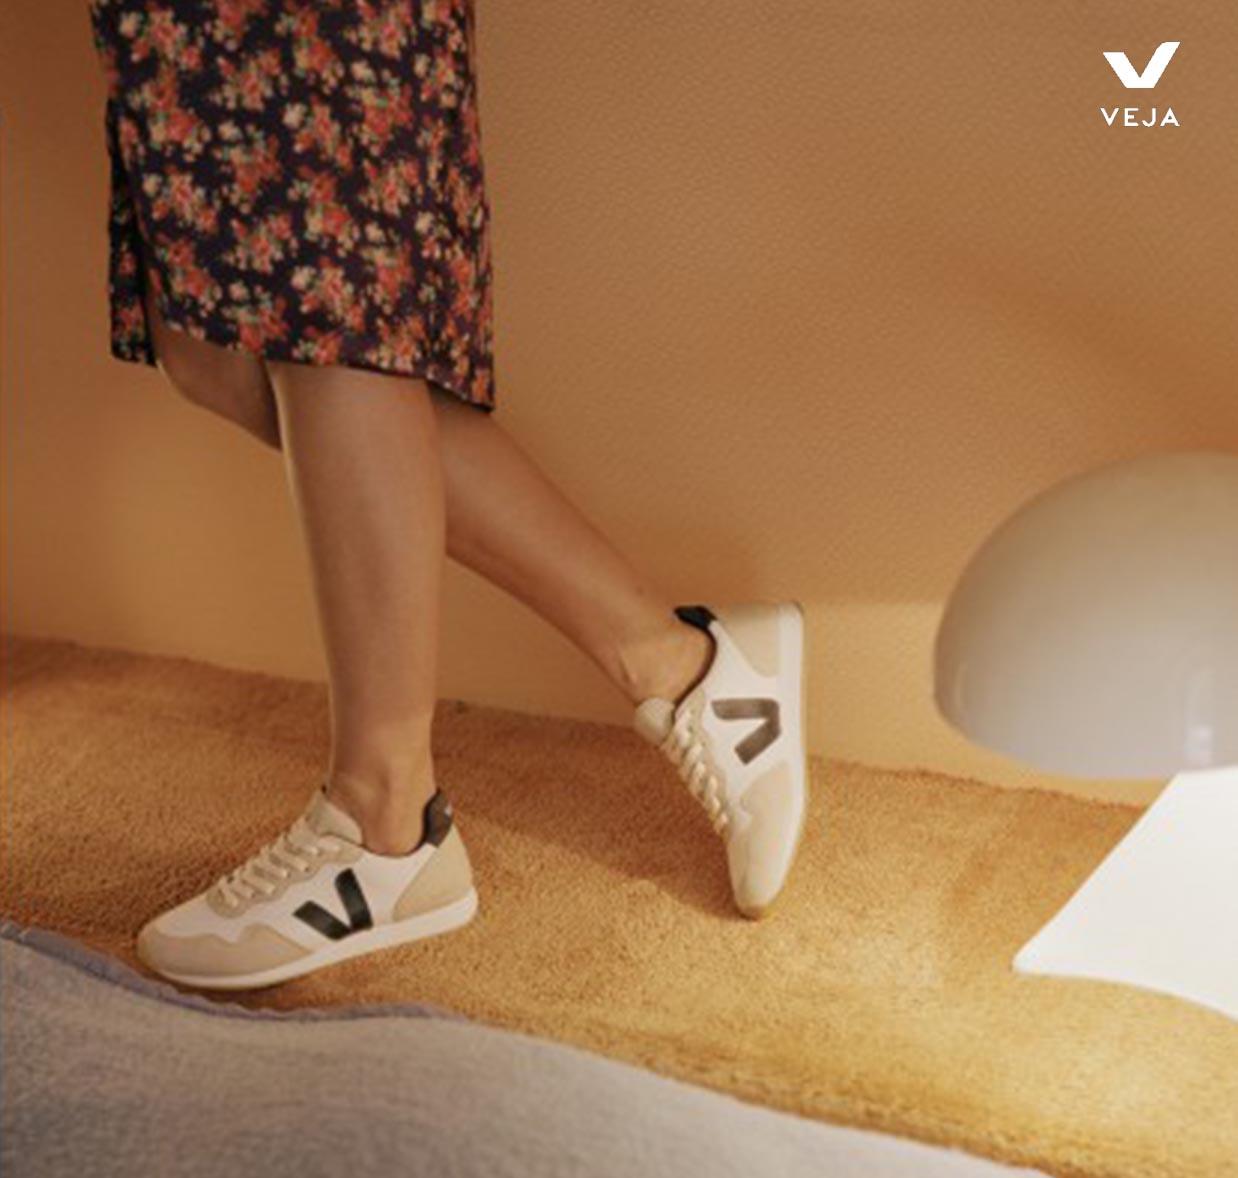 NEW!   Vegan sneakers by VEJA   Shop now!